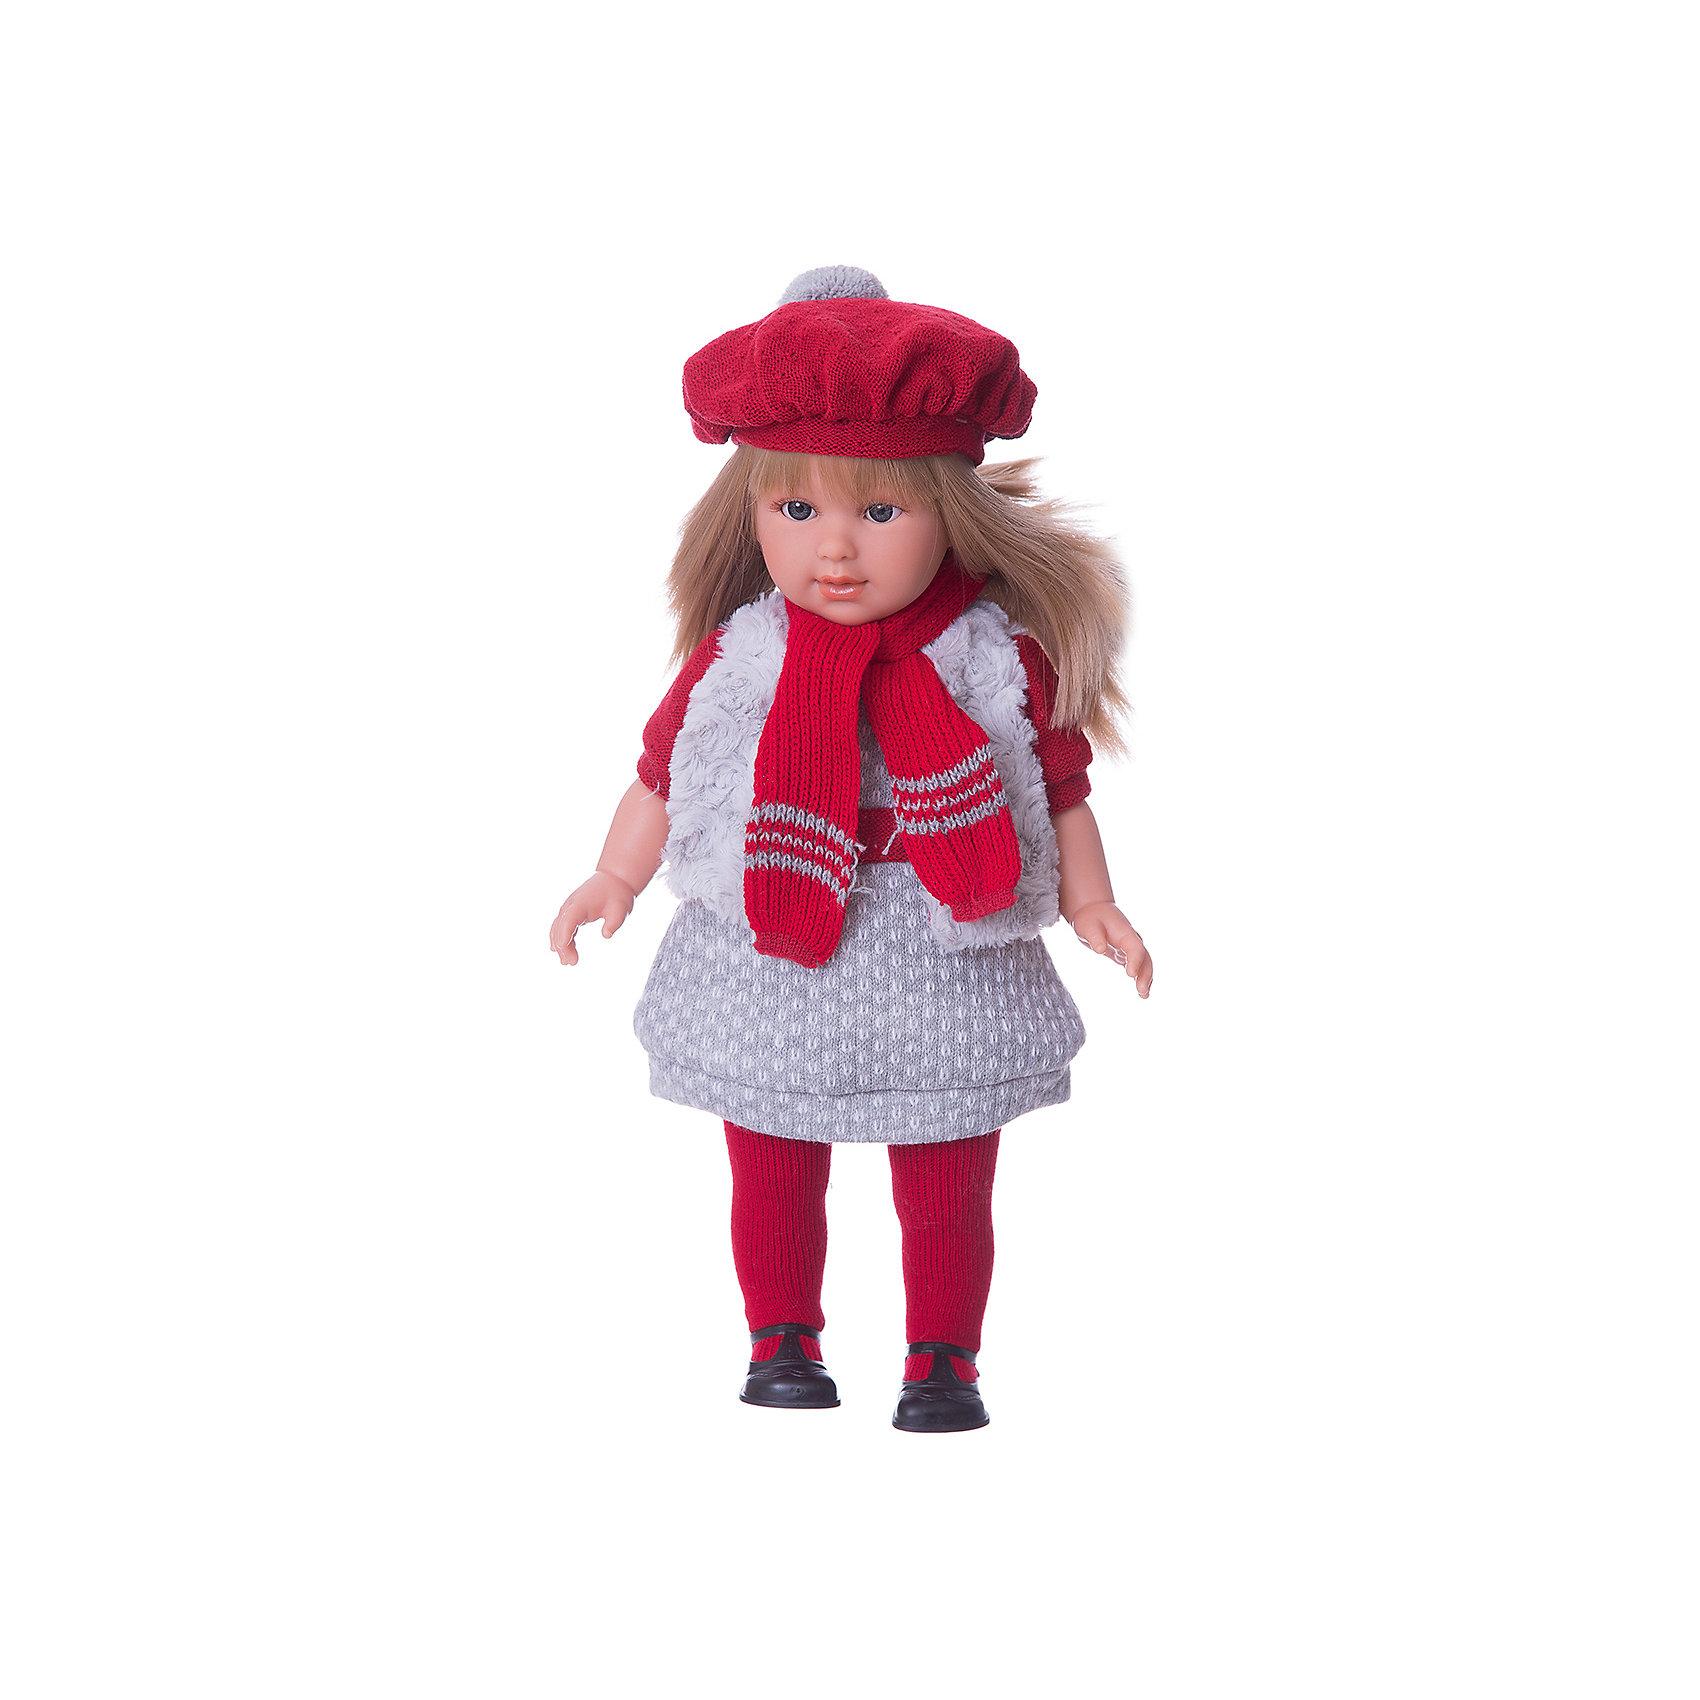 Llorens Кукла  Мартина, 40 см, Llorens куклы и одежда для кукол llorens кукла изабела 33 см со звуком